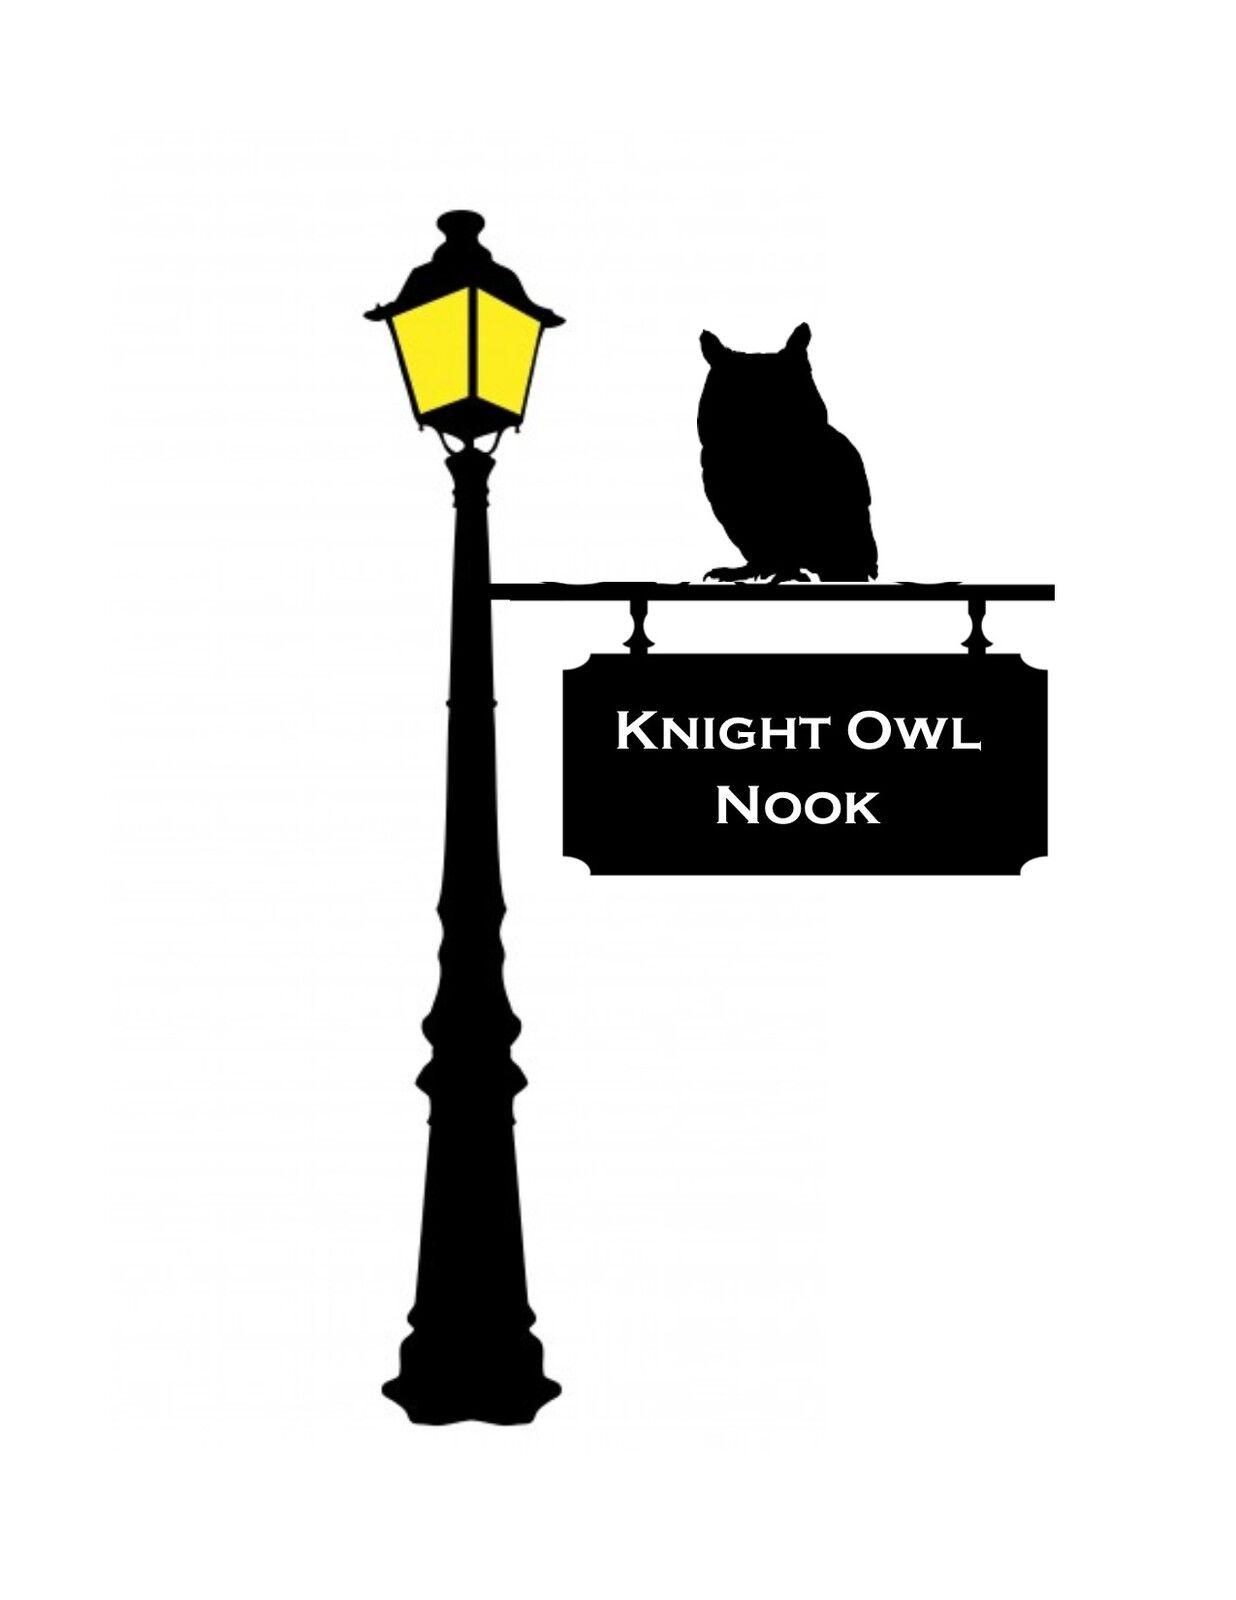 Knight Owl Nook